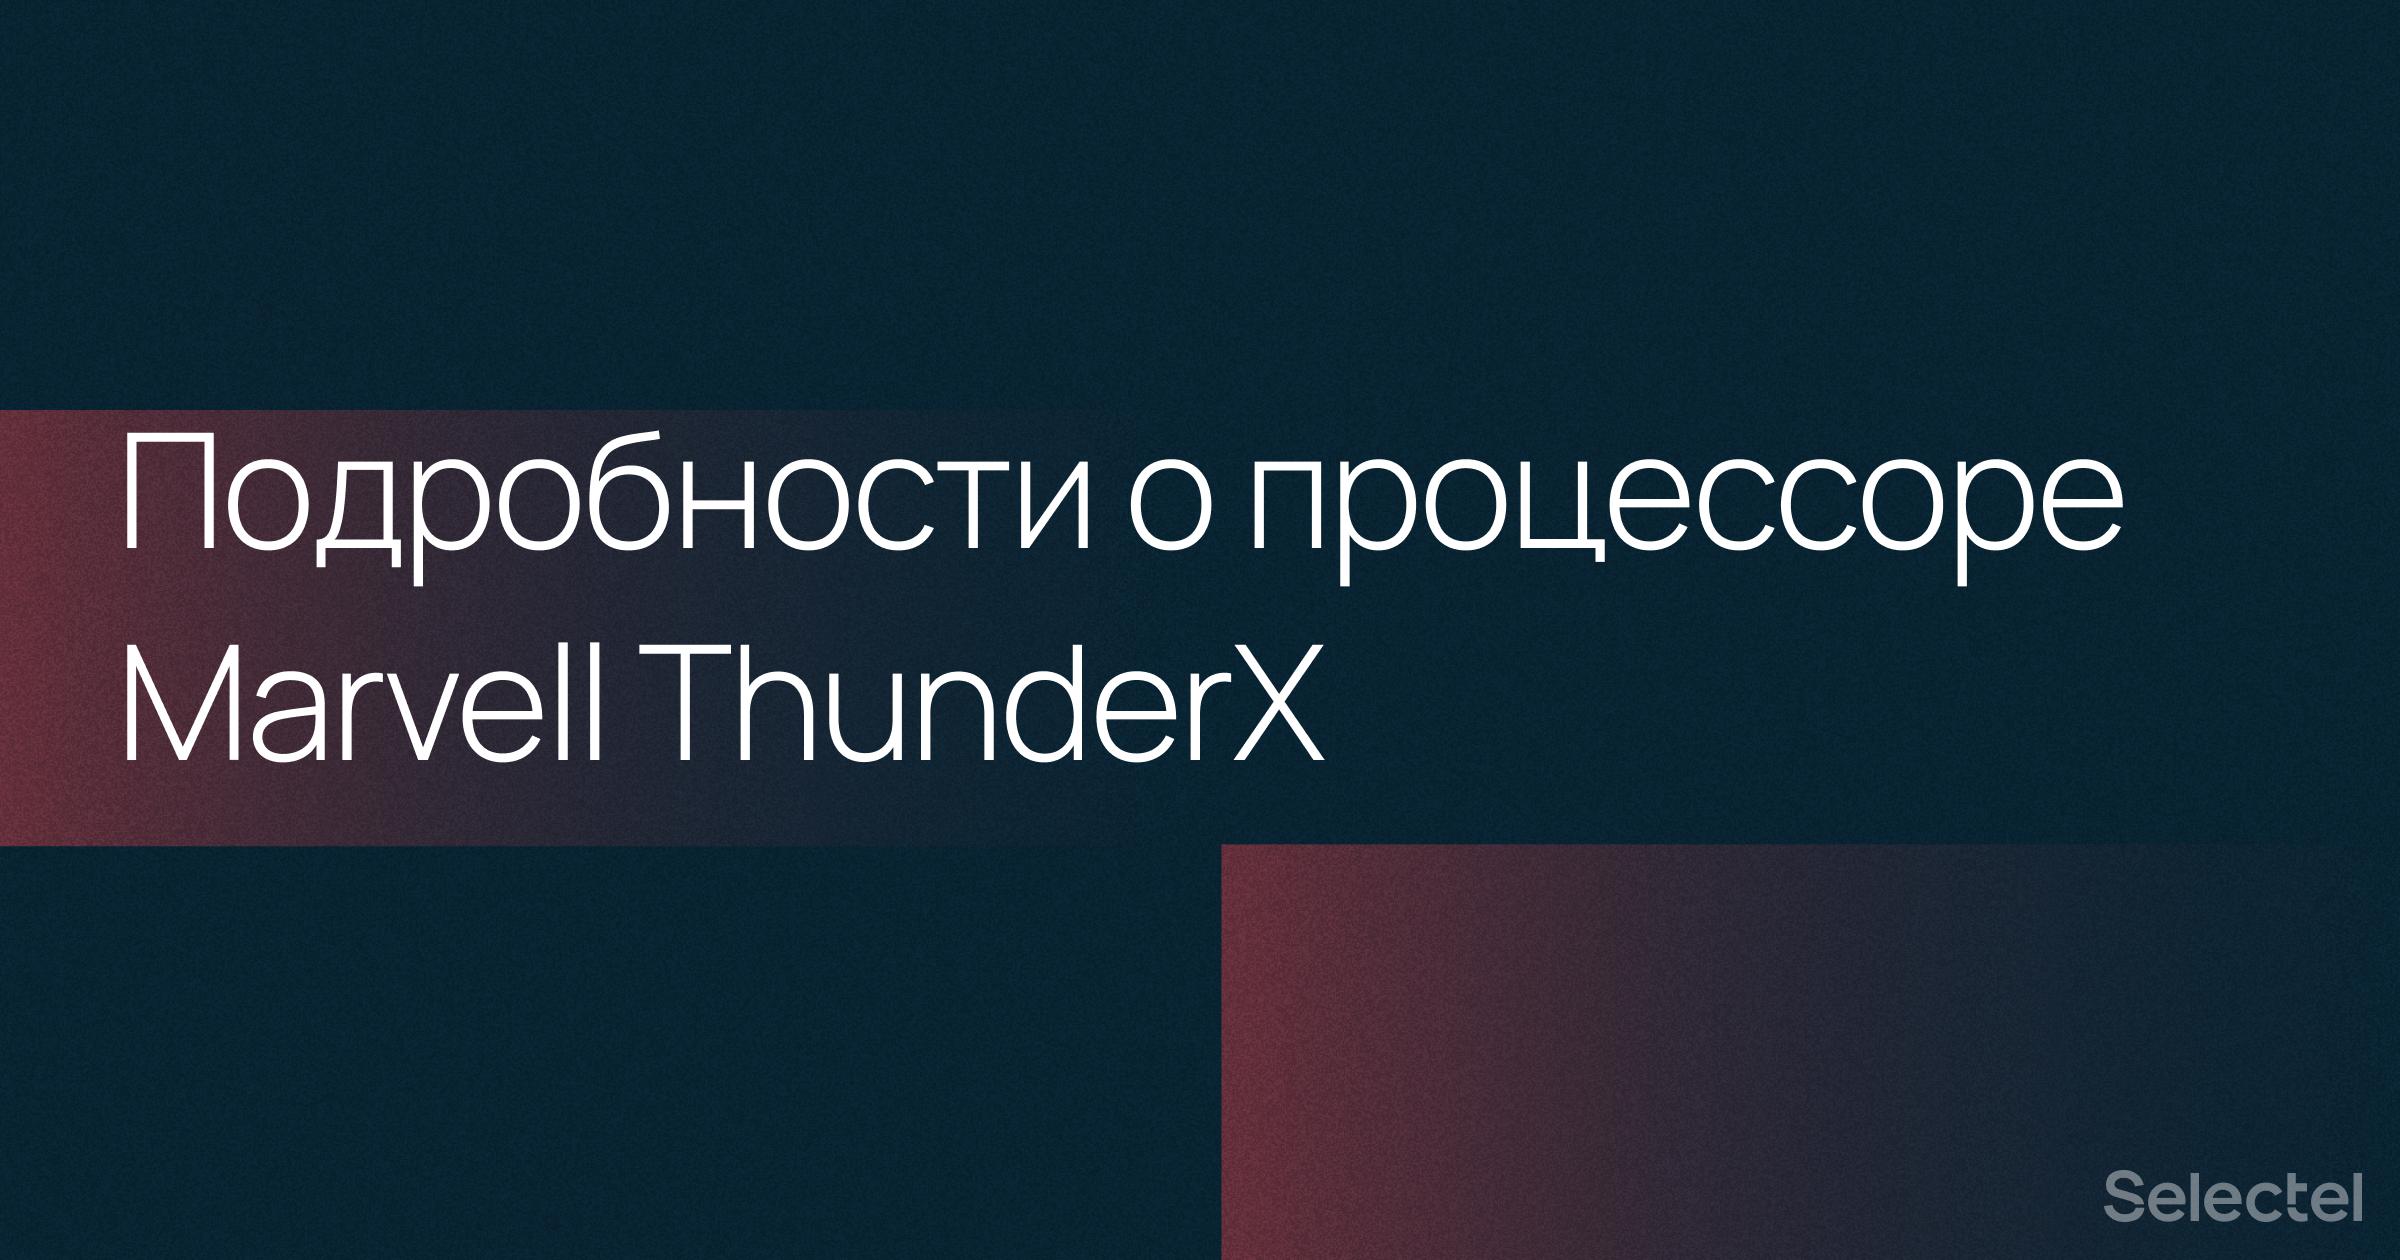 ARM для серверов подробности о процессоре Marvell ThunderX3 с 60 ядрами в SCM, 96 ядрами в MCM и SMT4